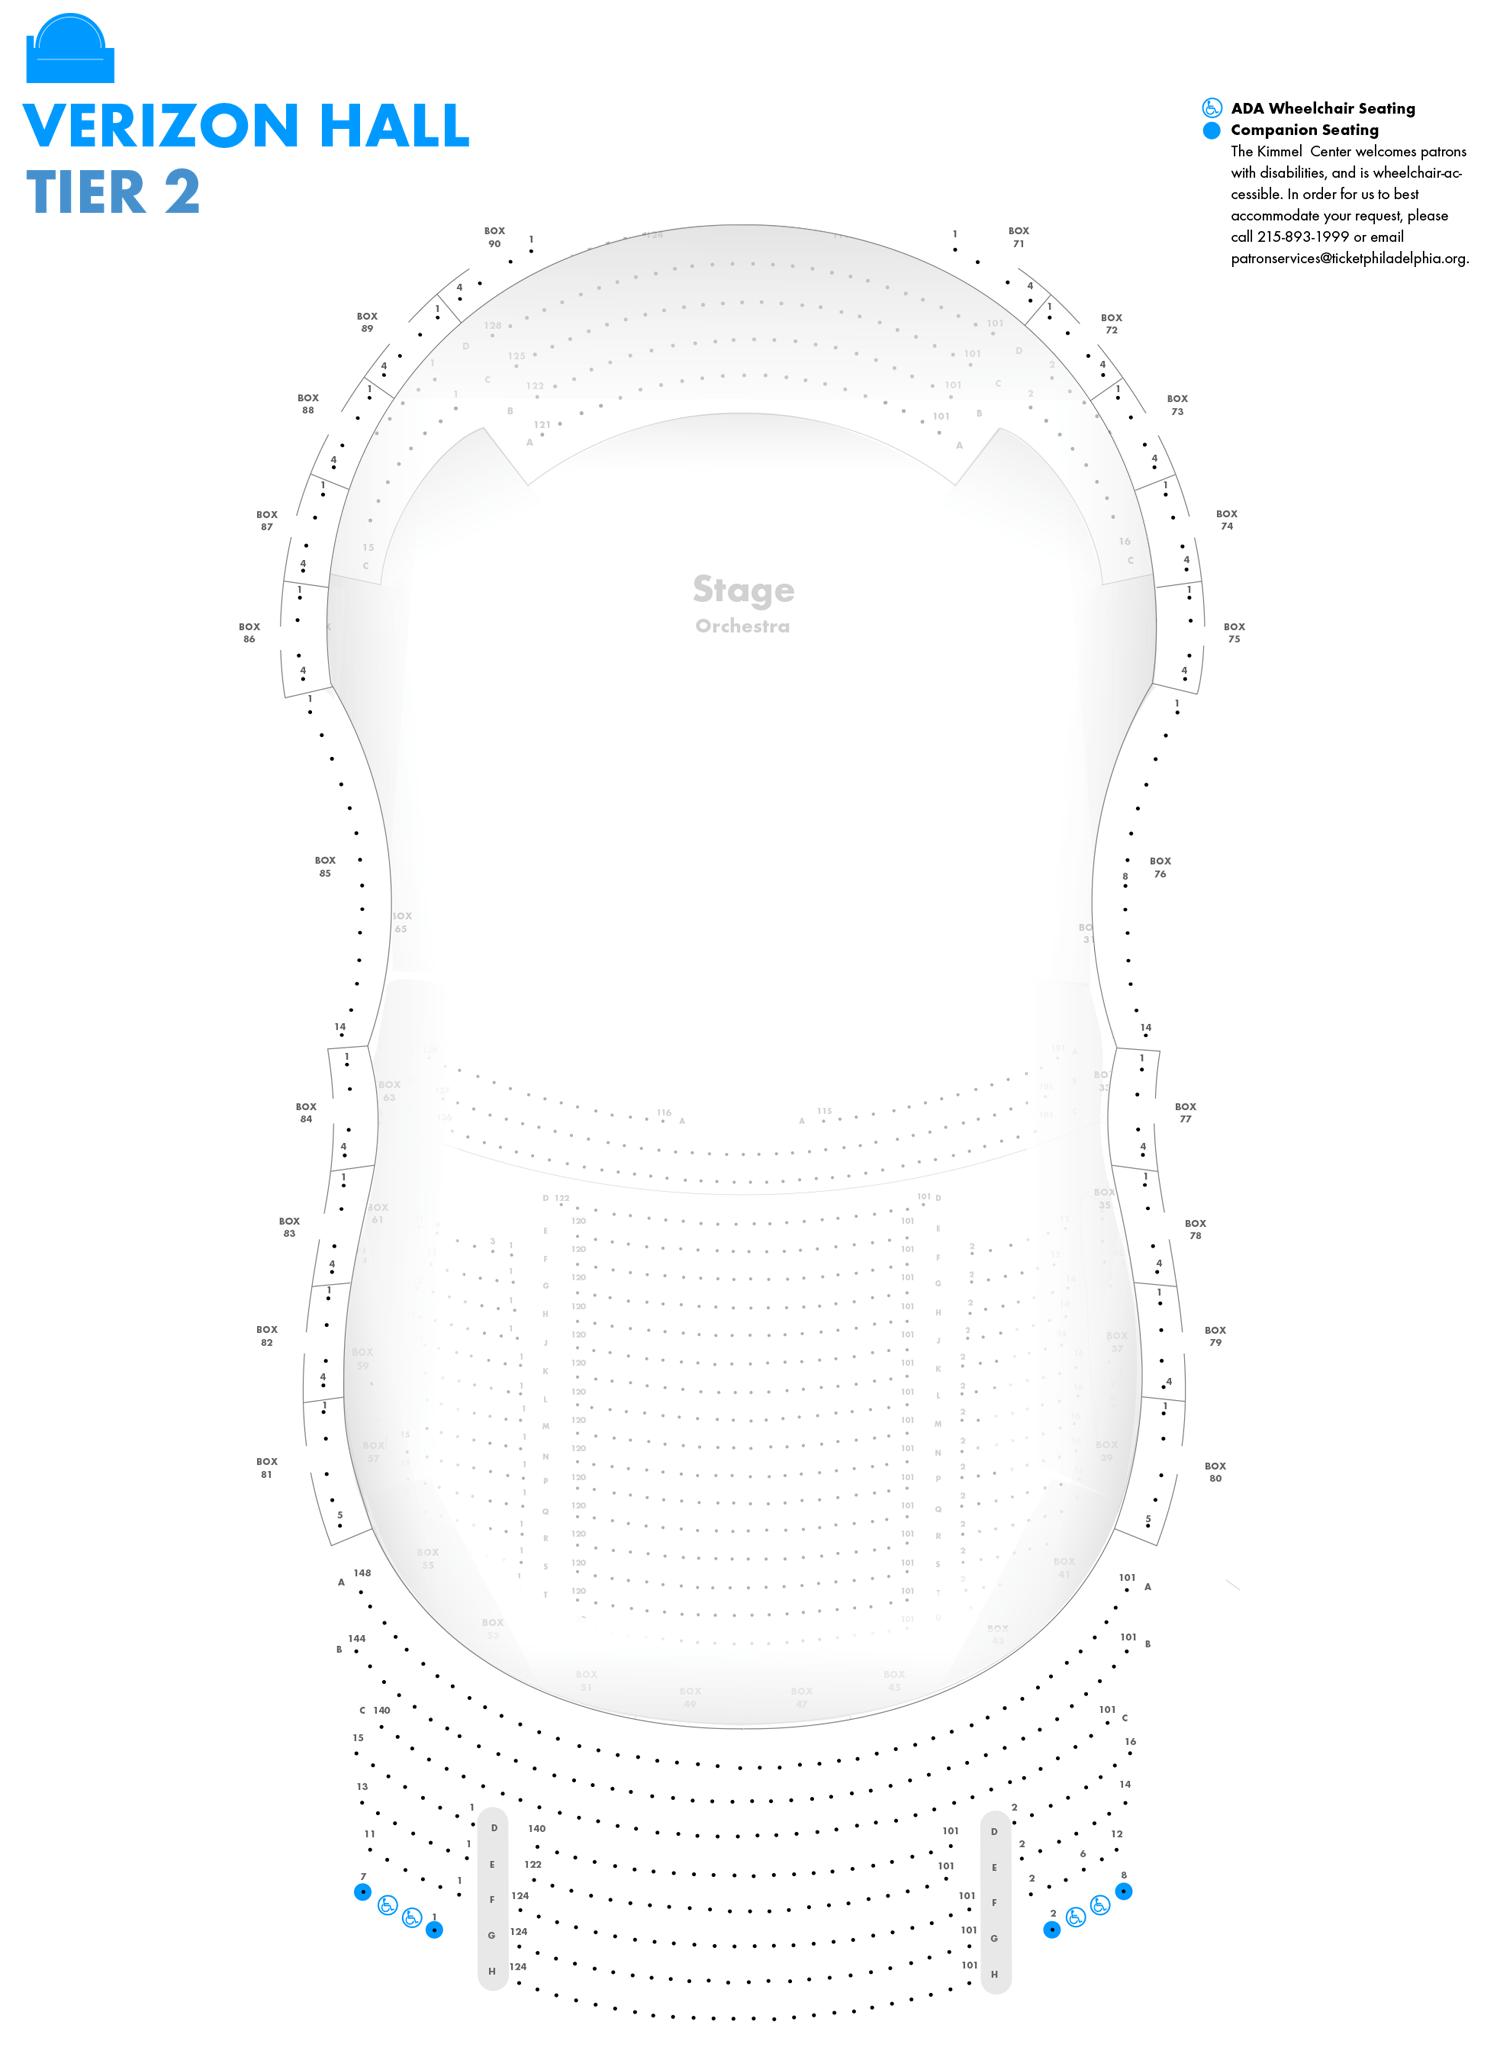 hight resolution of verizon hall second tier seating chart